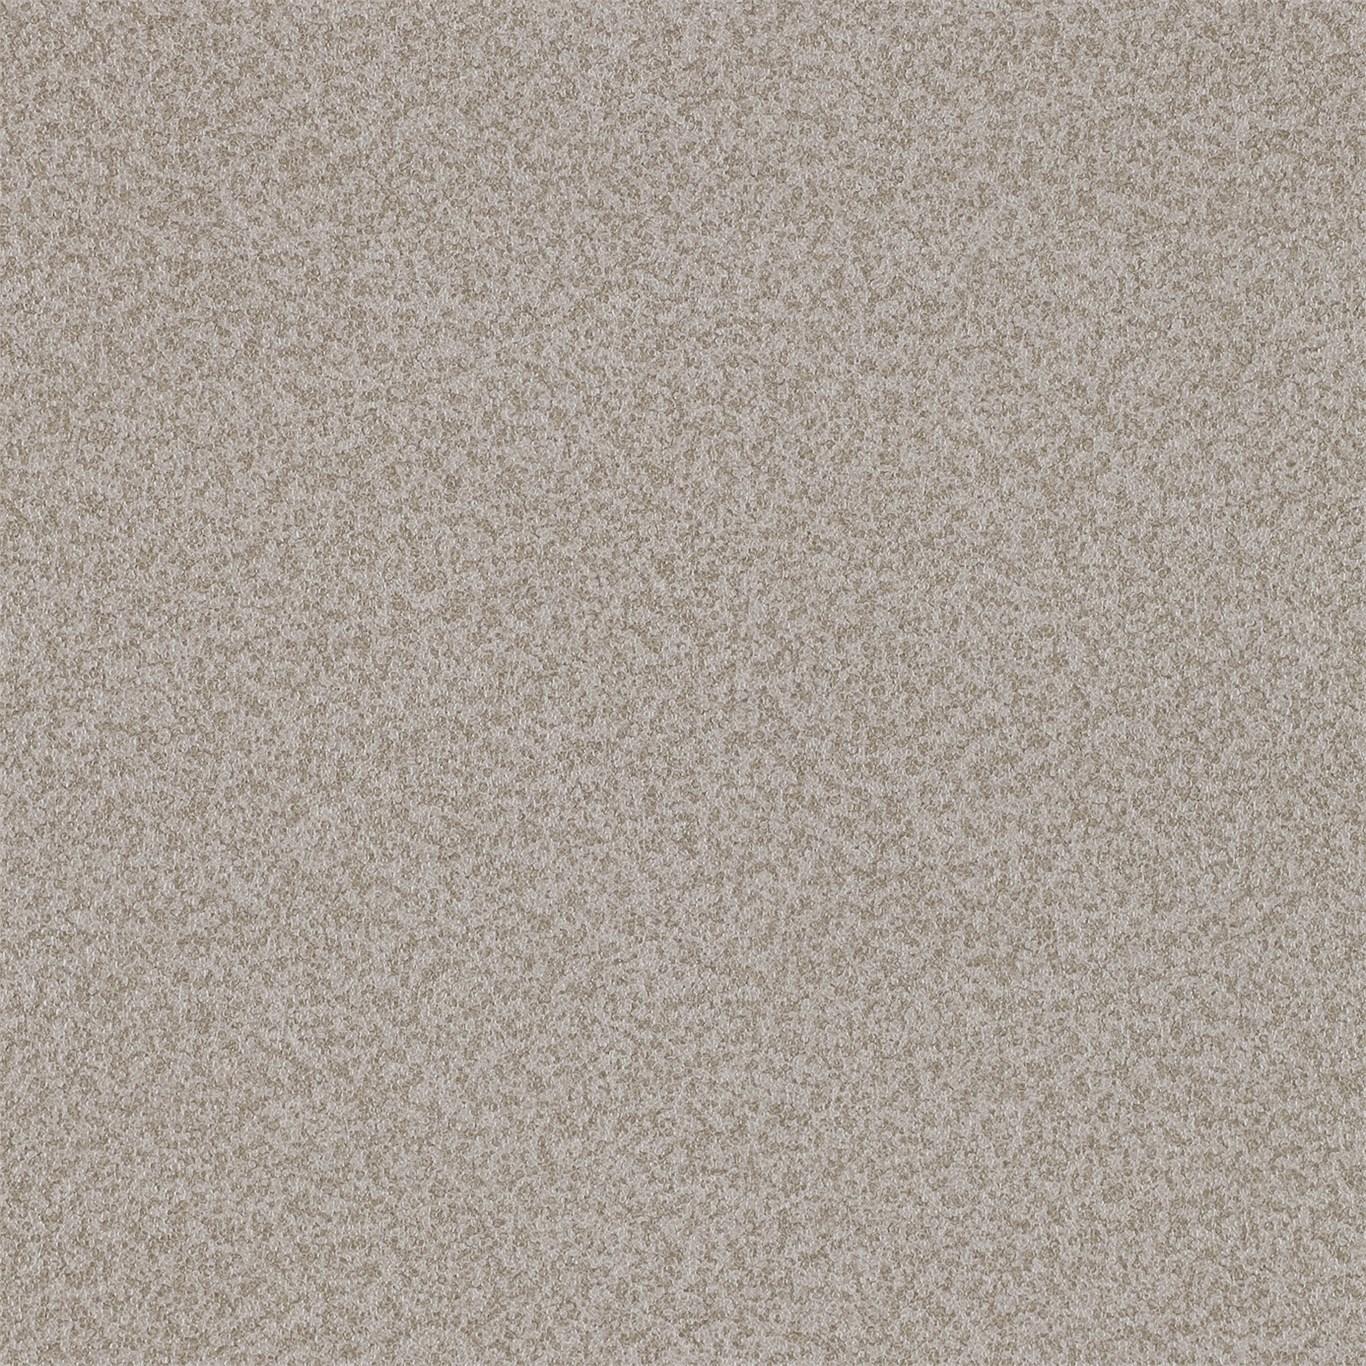 Английские обои Zoffany,  коллекция Prism Vinyls, артикул311770